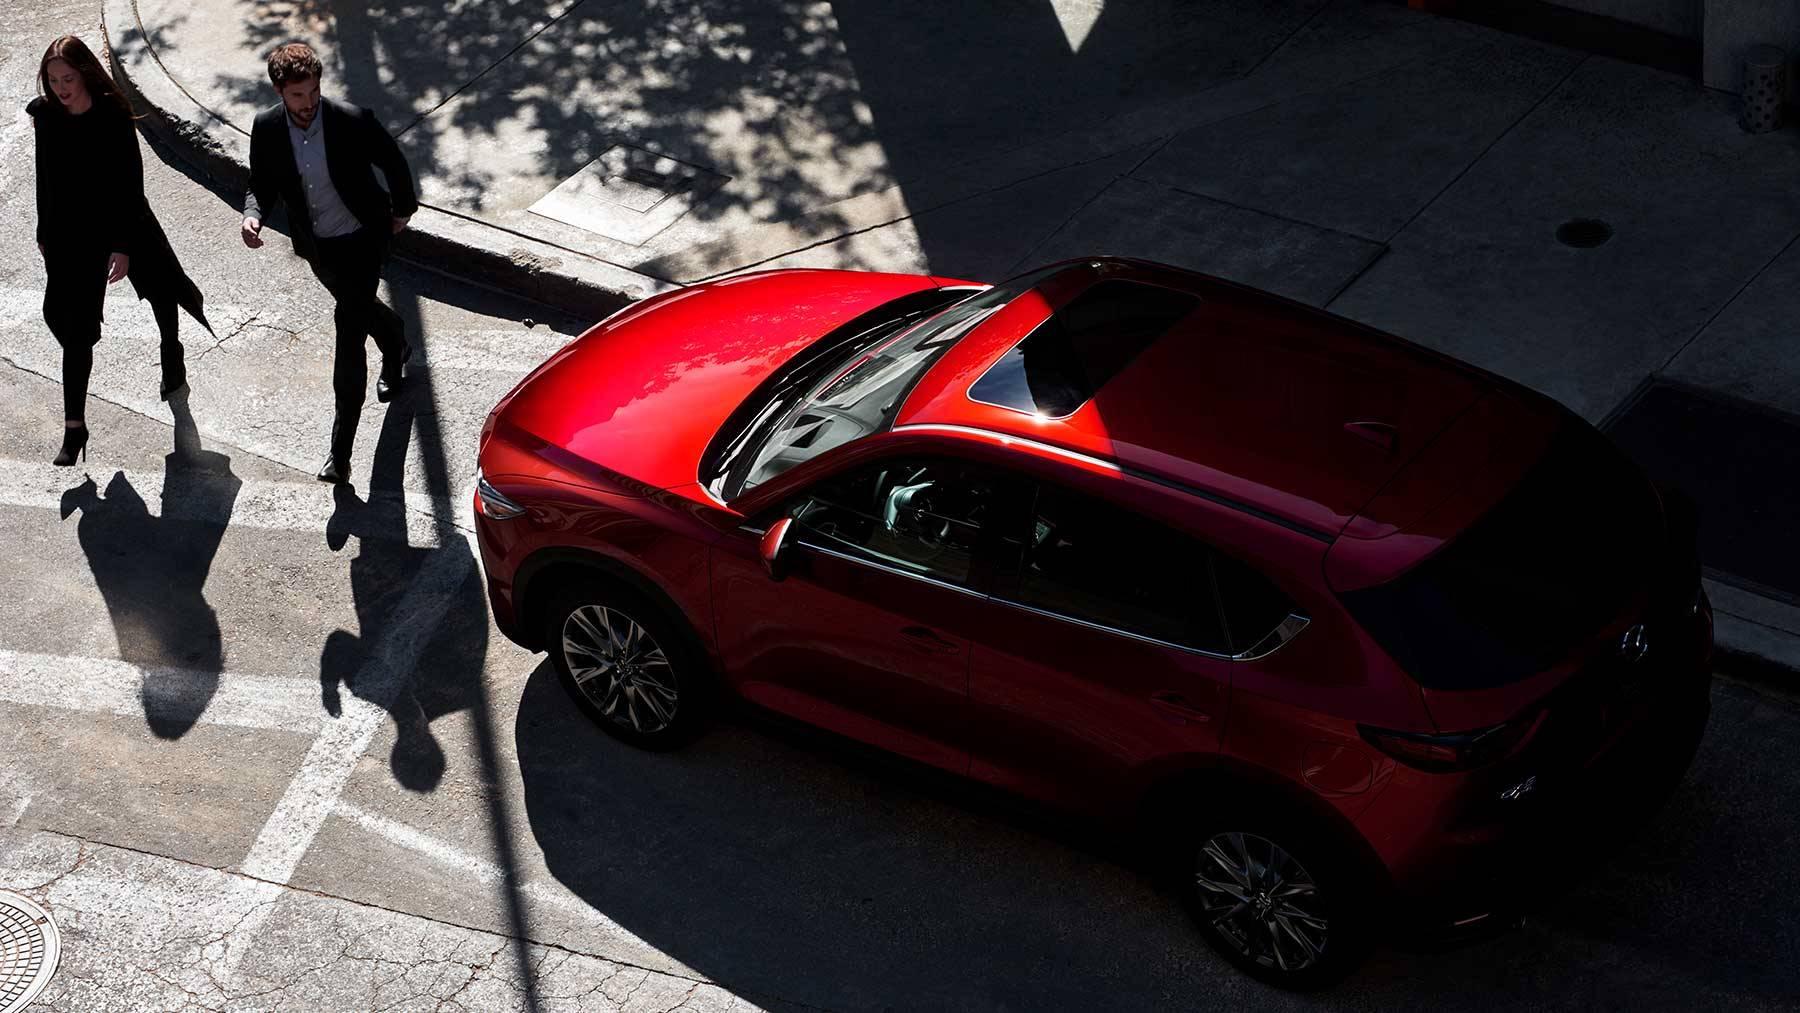 2019 Mazda CX-5 Leasing near Lakeland, FL